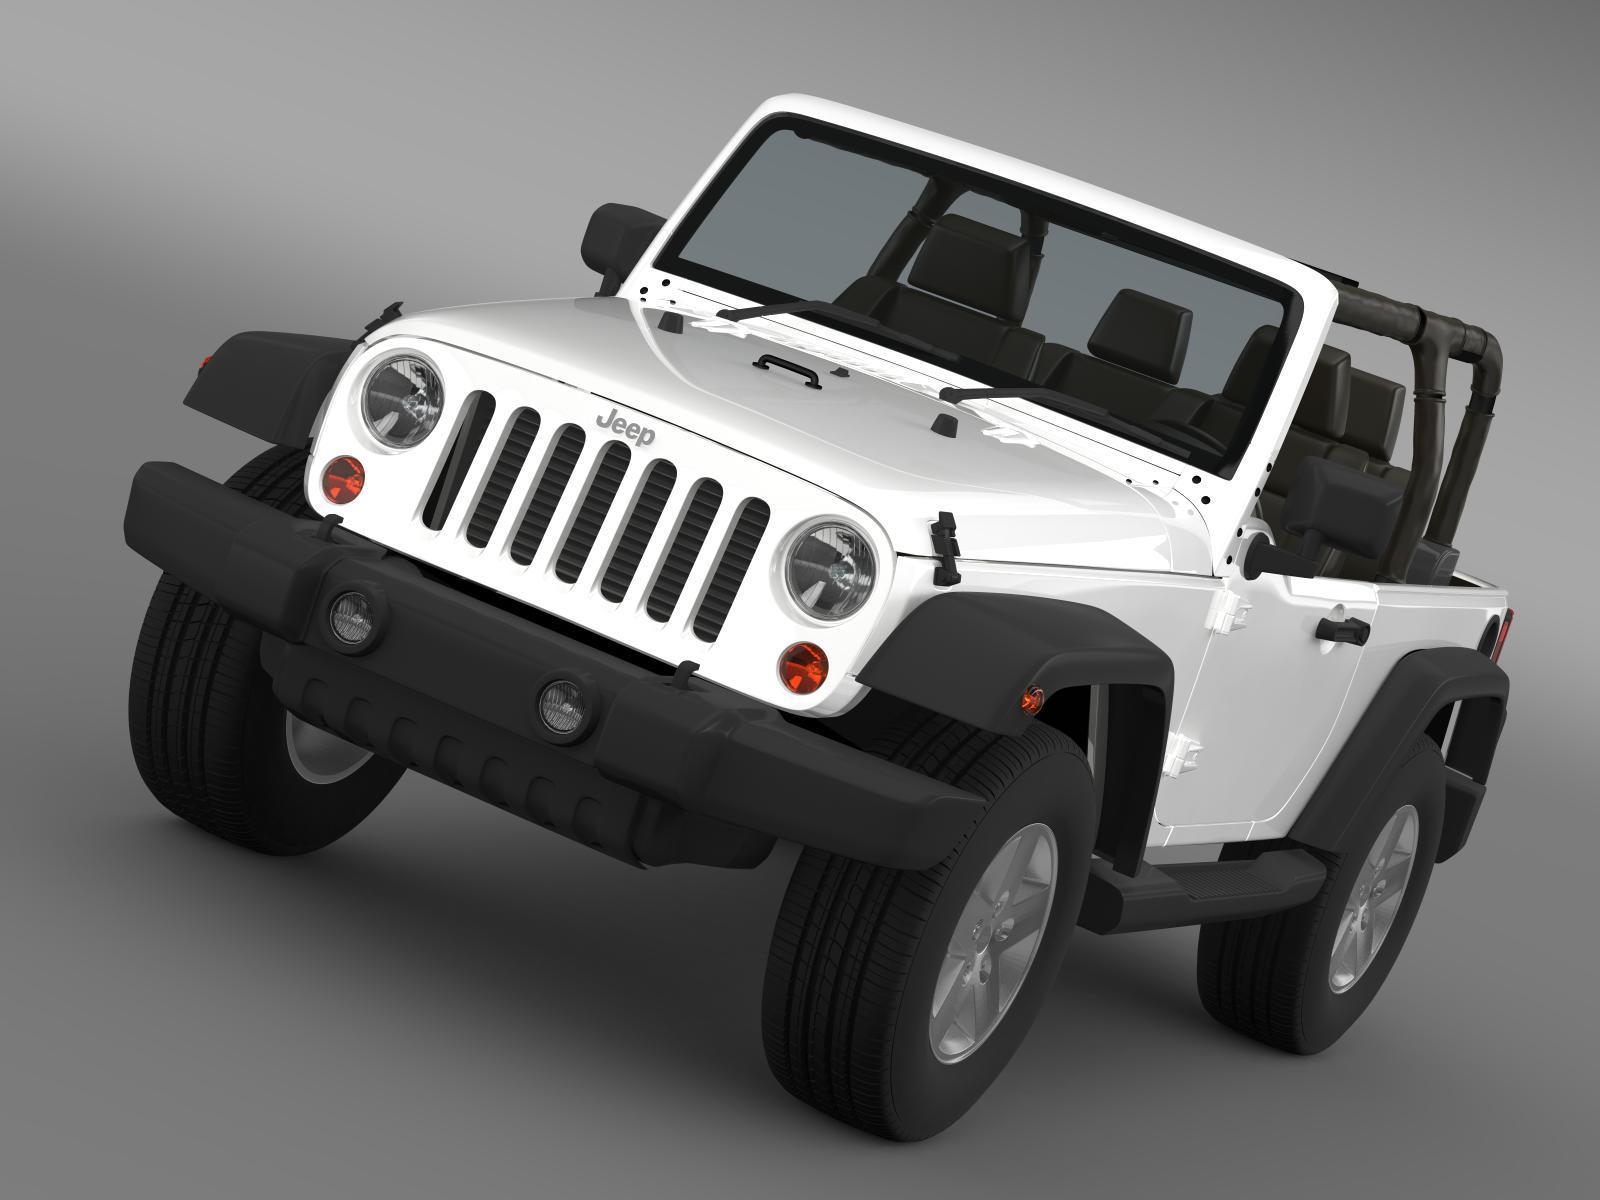 louisiana city navarre billy in unlimited sahara charles lake wrangler certified jeep revo